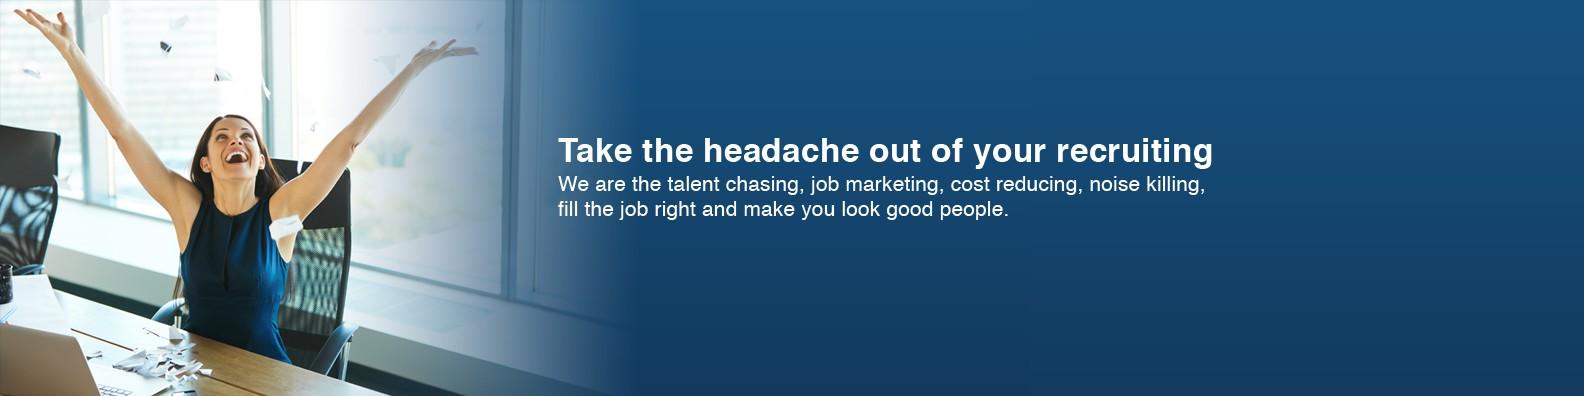 Accolo Recruitment Process Outsourcing | LinkedIn